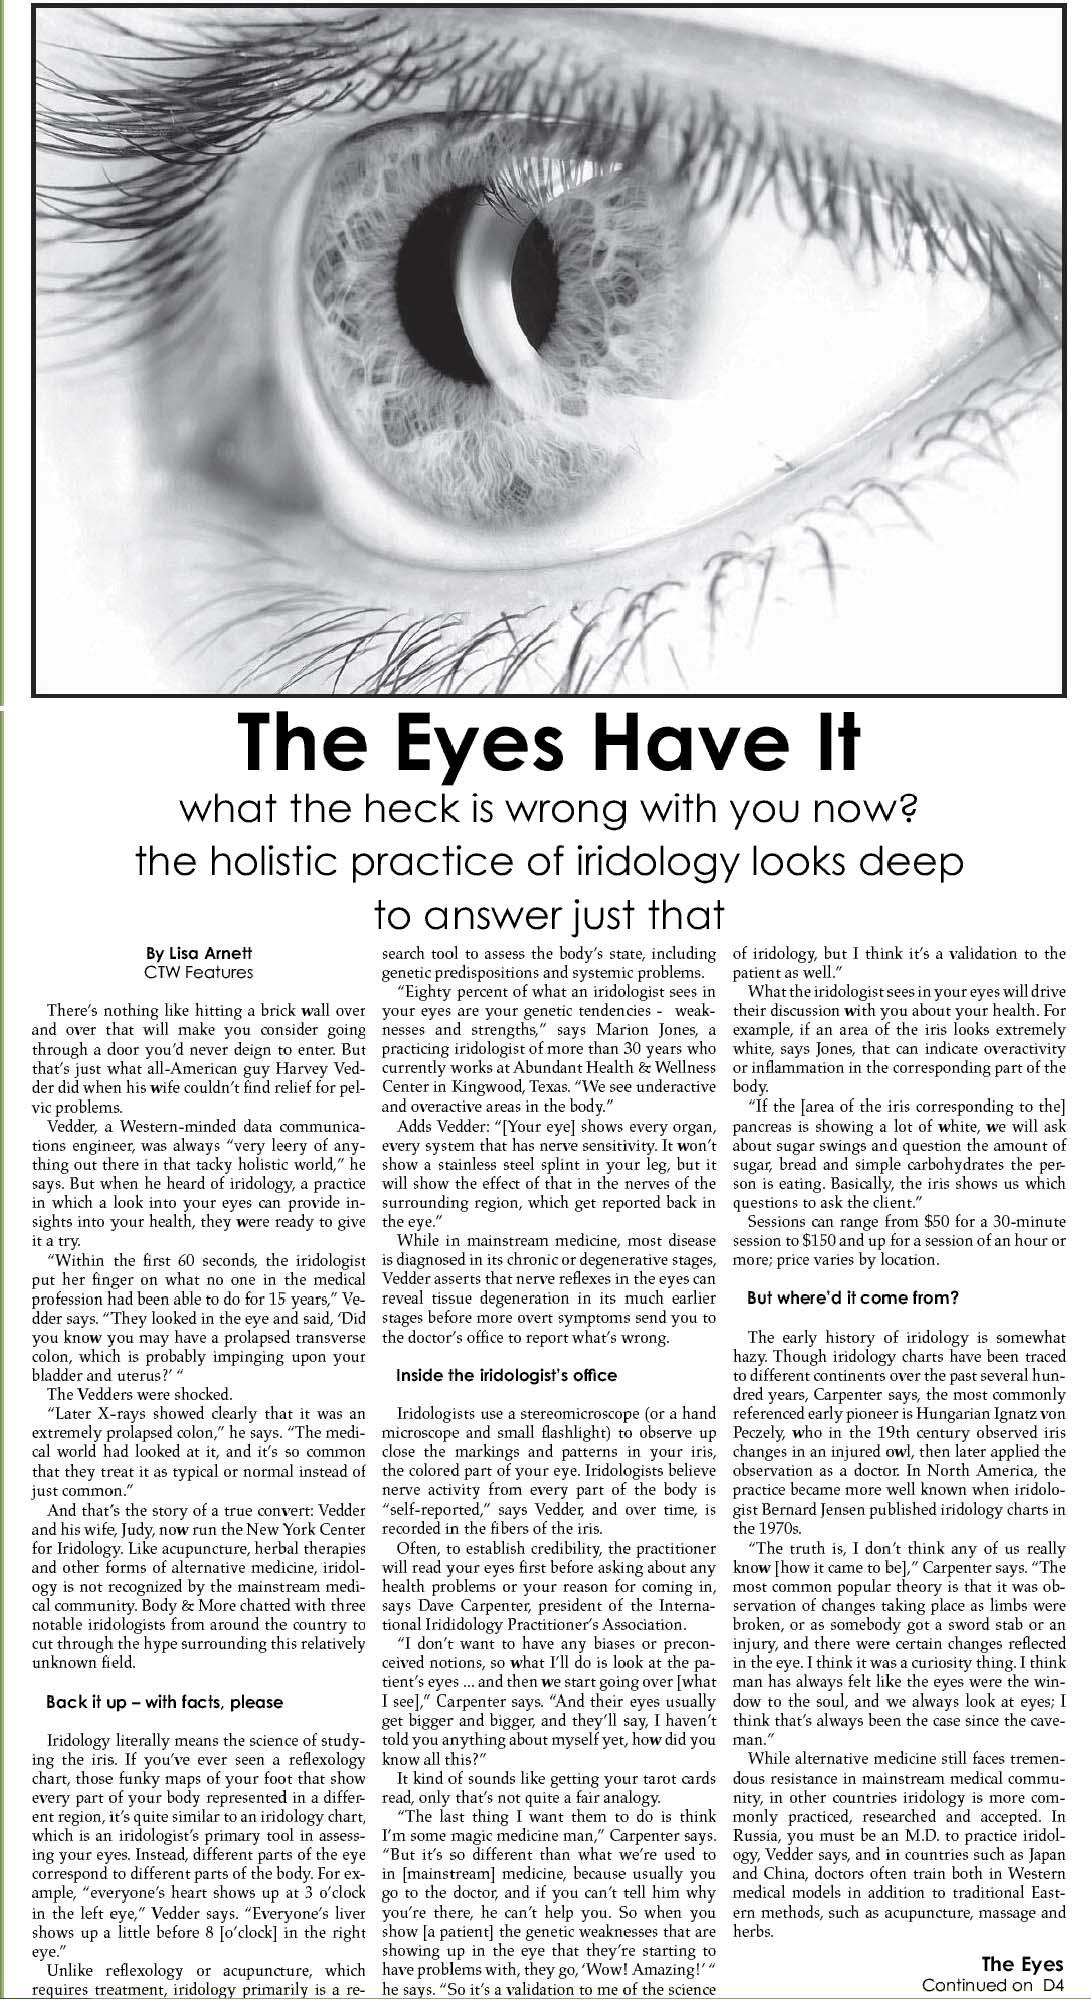 The Vindicator - October 14, 2007